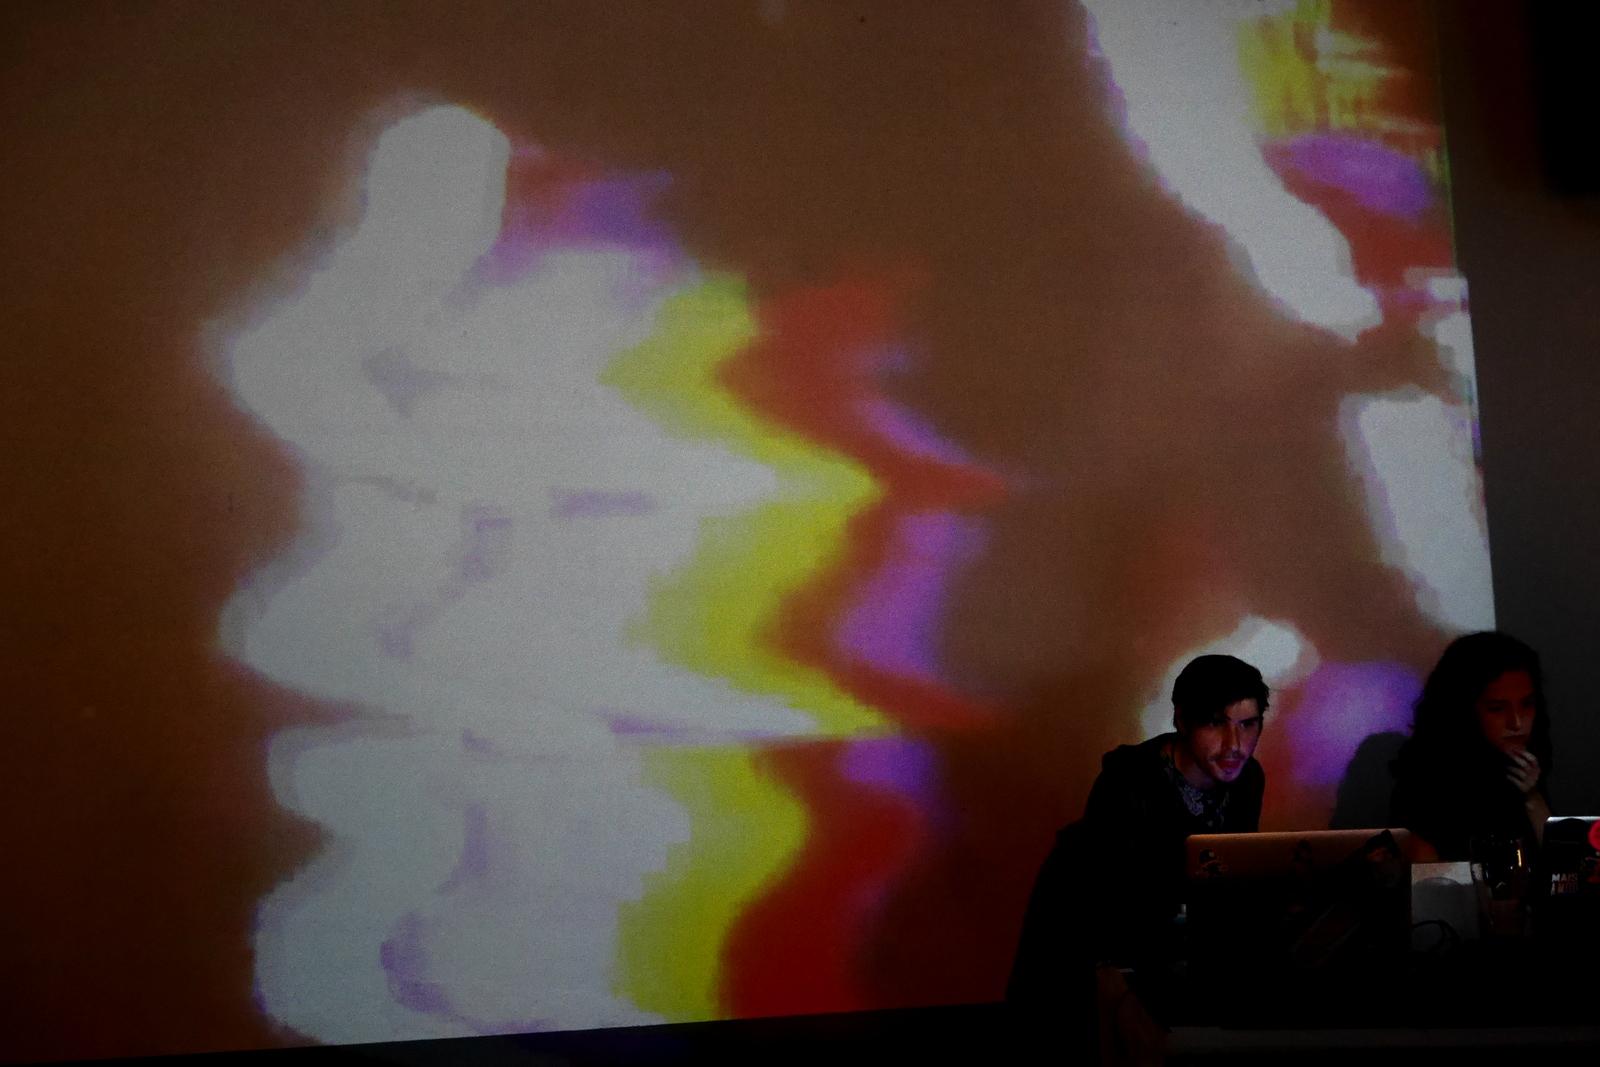 13.10.2016 - Signal Festival: BYOB Prague 2016 [Prag, CZ]